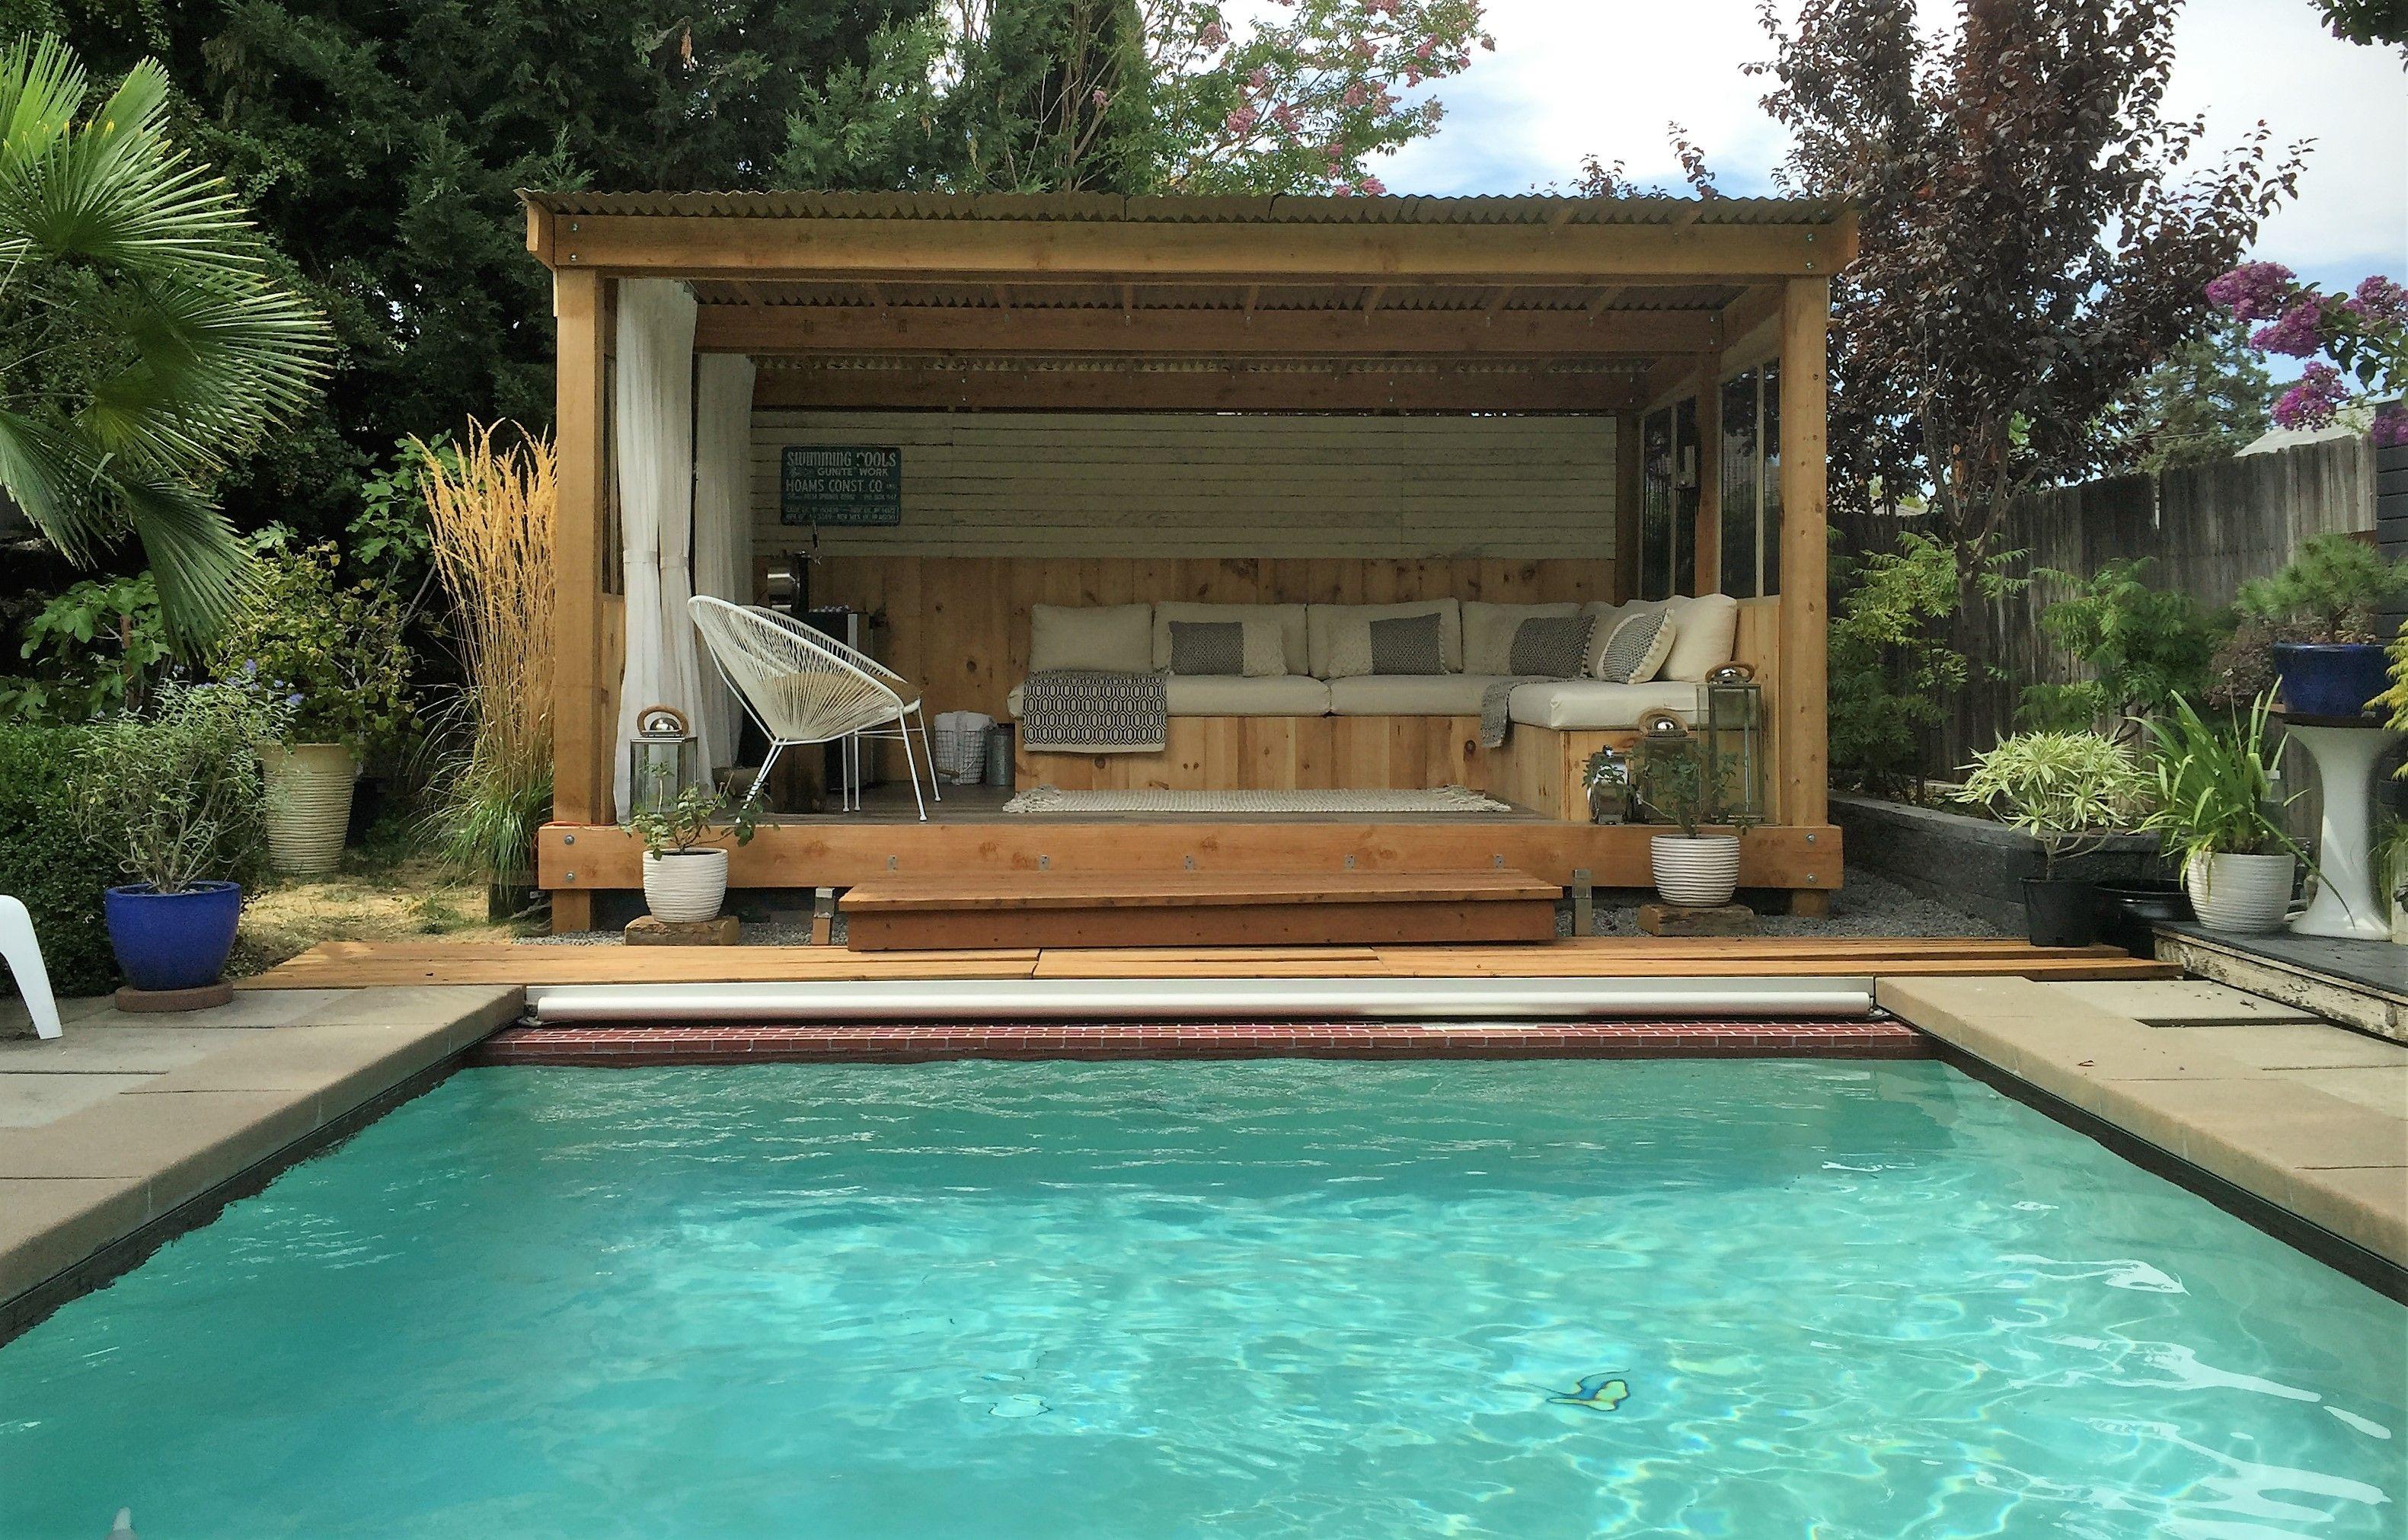 My Staycation! | Outdoor living, Outdoor decor, Backyard on My Backyard Living id=84945